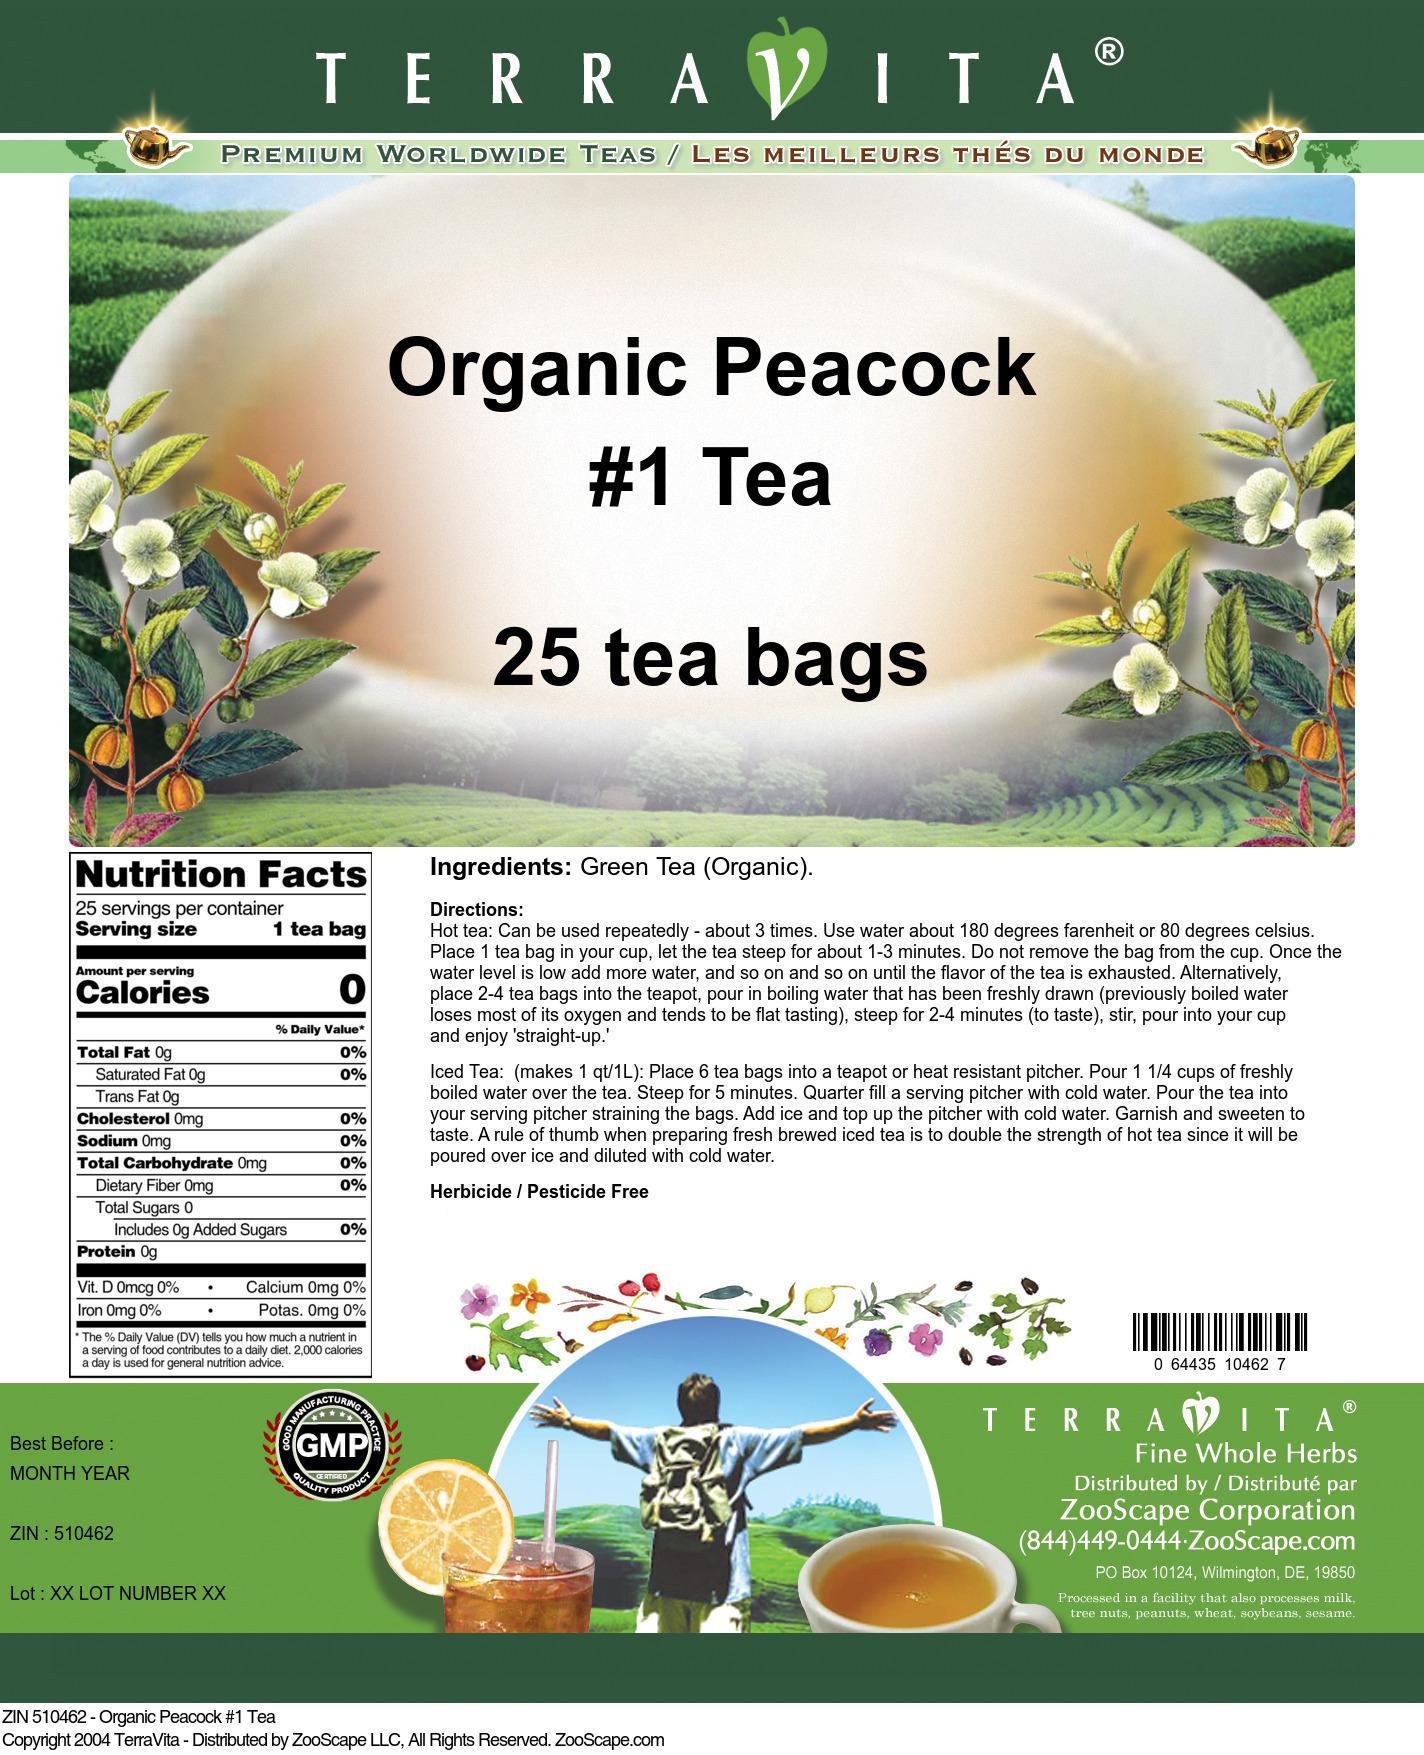 Organic Peacock #1 Tea